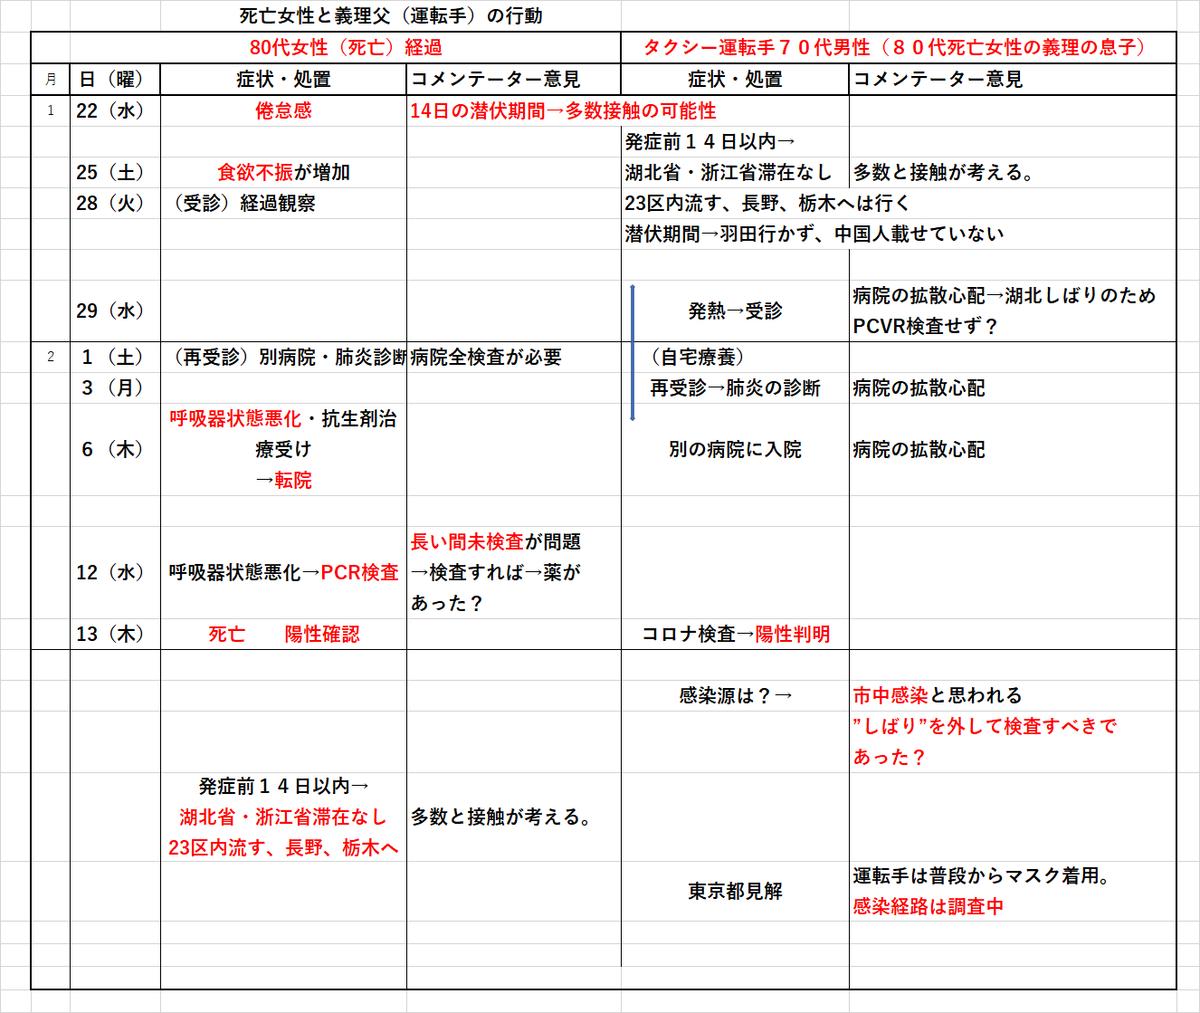 f:id:oyakudachi395:20200214151706p:plain